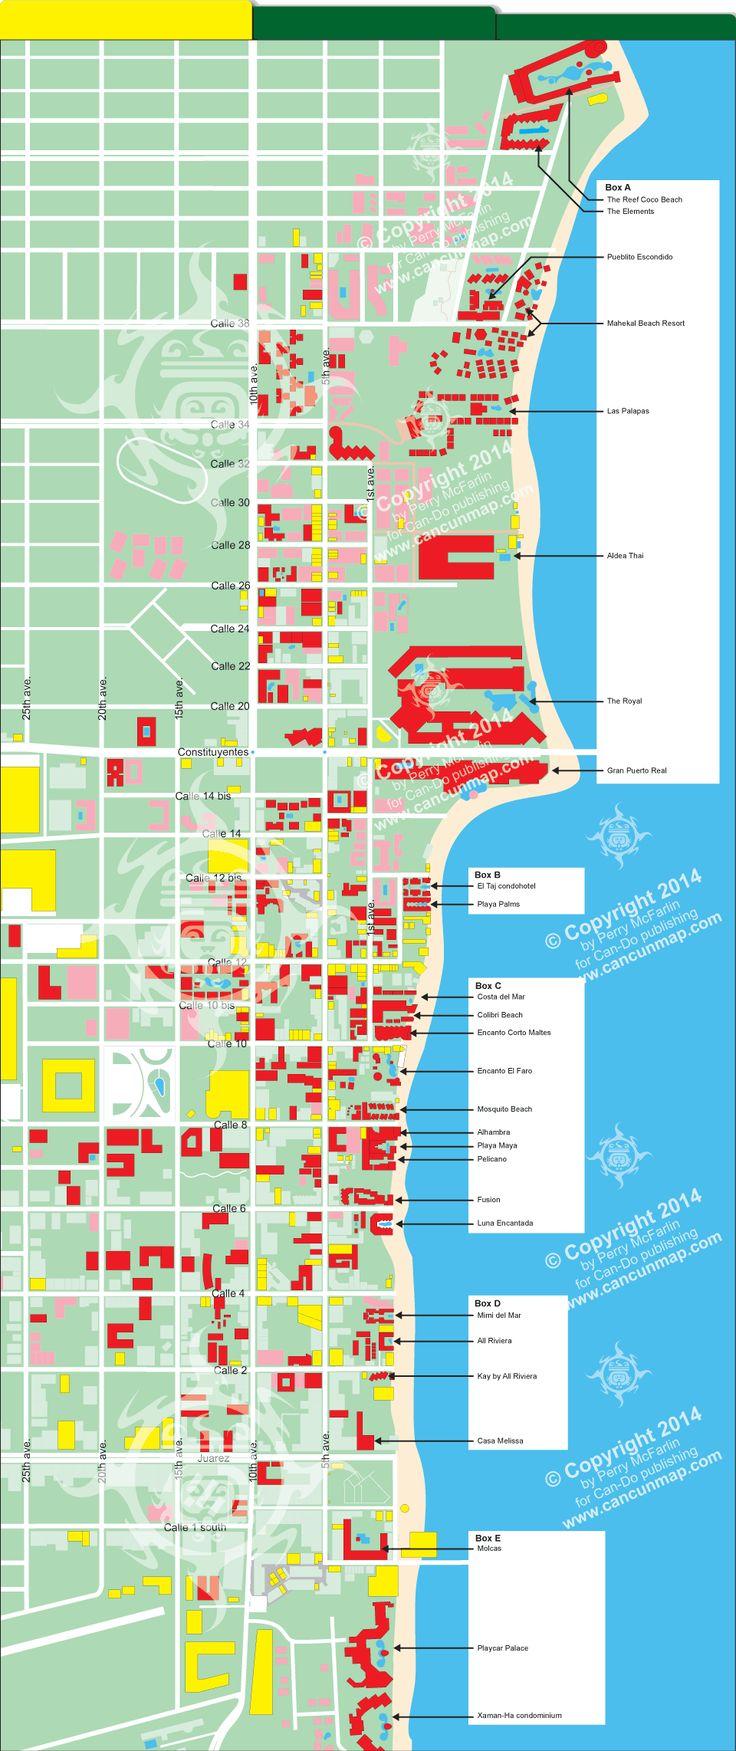 Playa del Carmen map of beachfront hotels